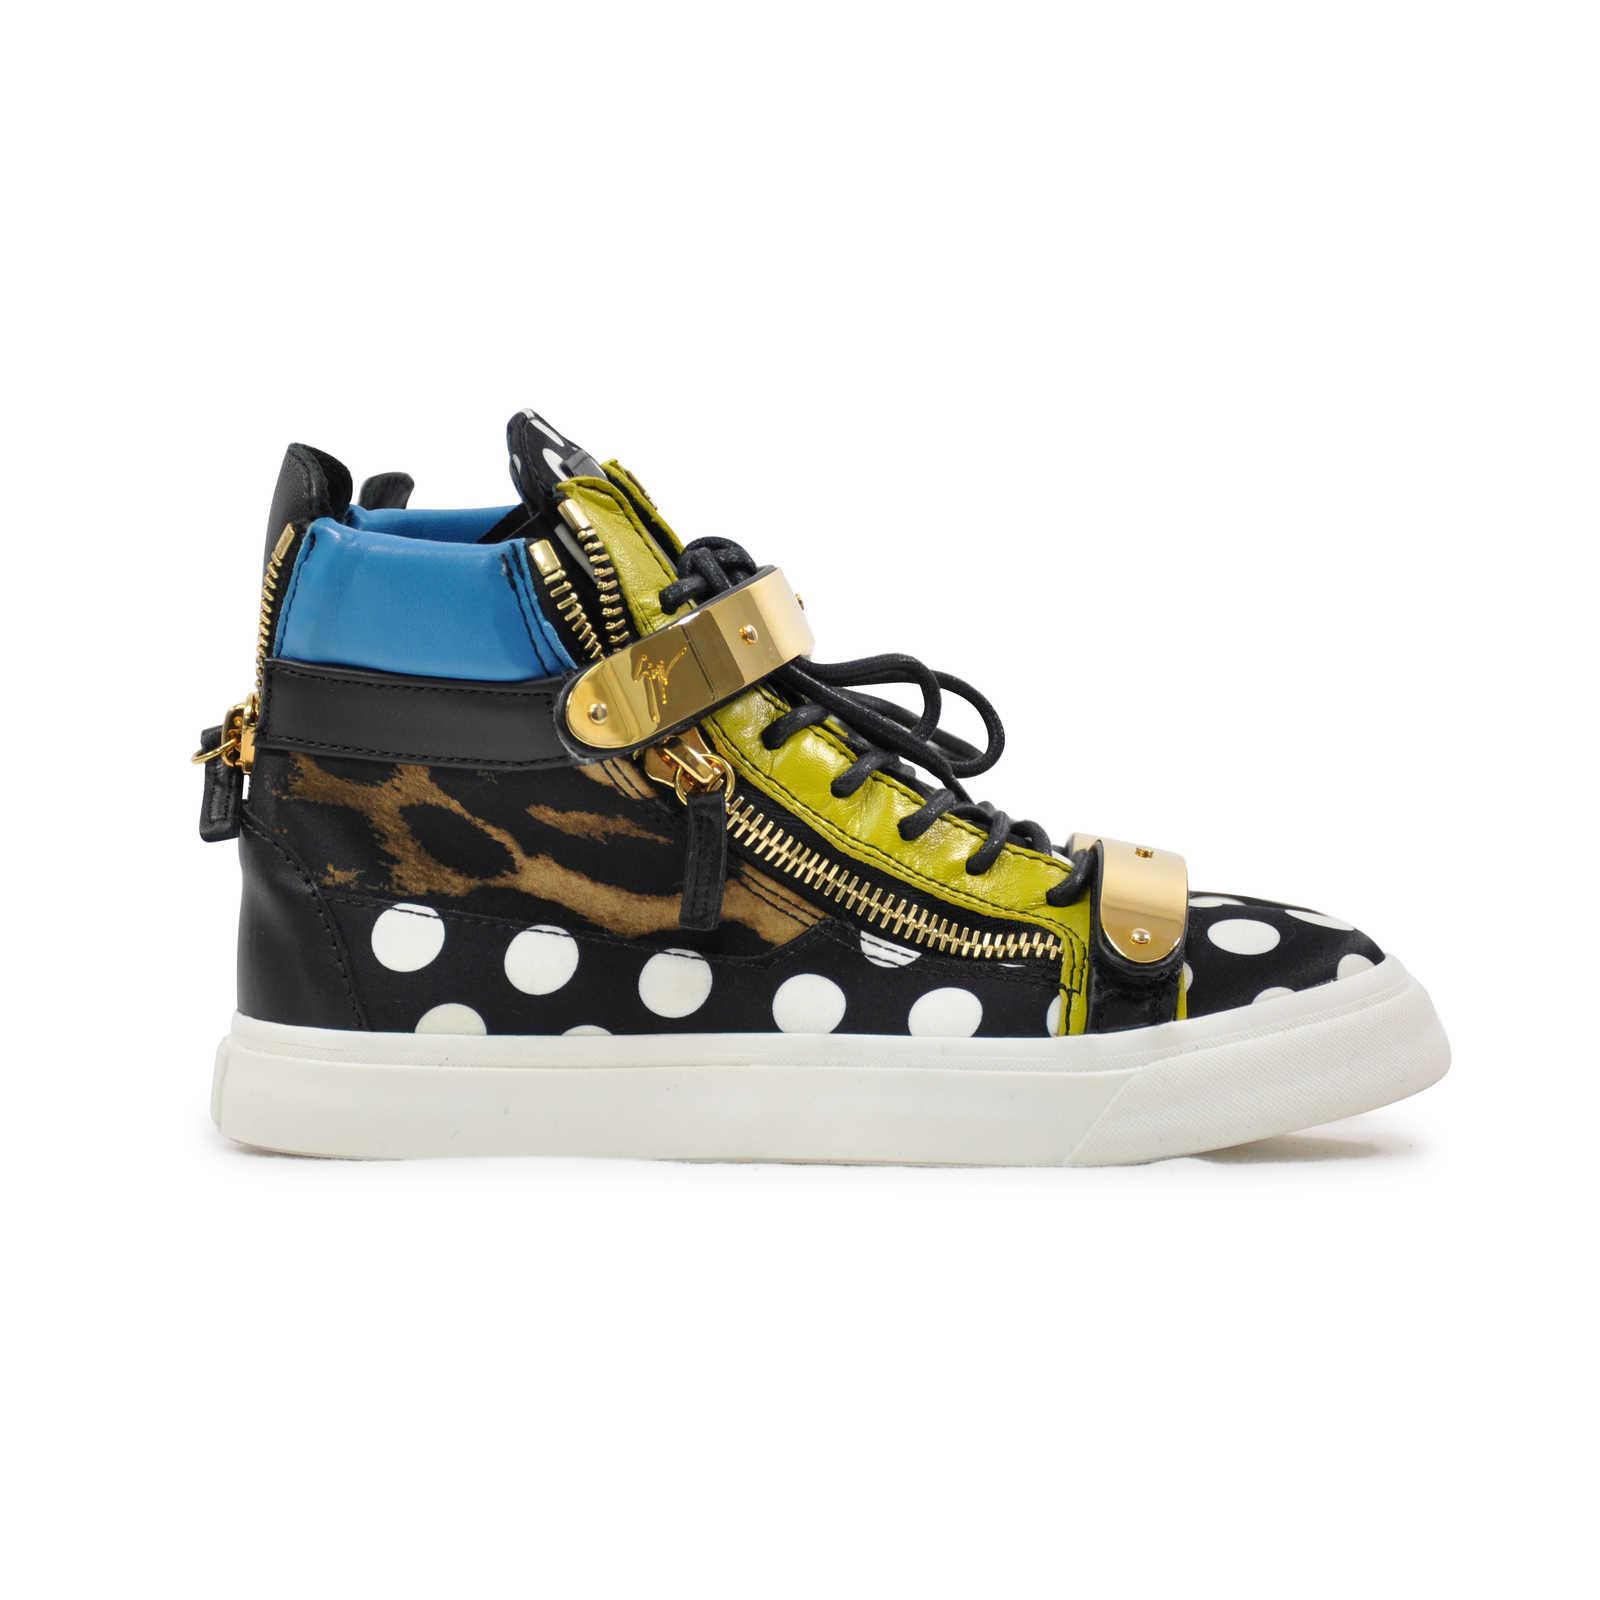 6ee087878f2ef ... Authentic Second Hand Giuseppe Zanotti London Polka Dot Satin Hi Top  Sneakers (PSS-200 ...